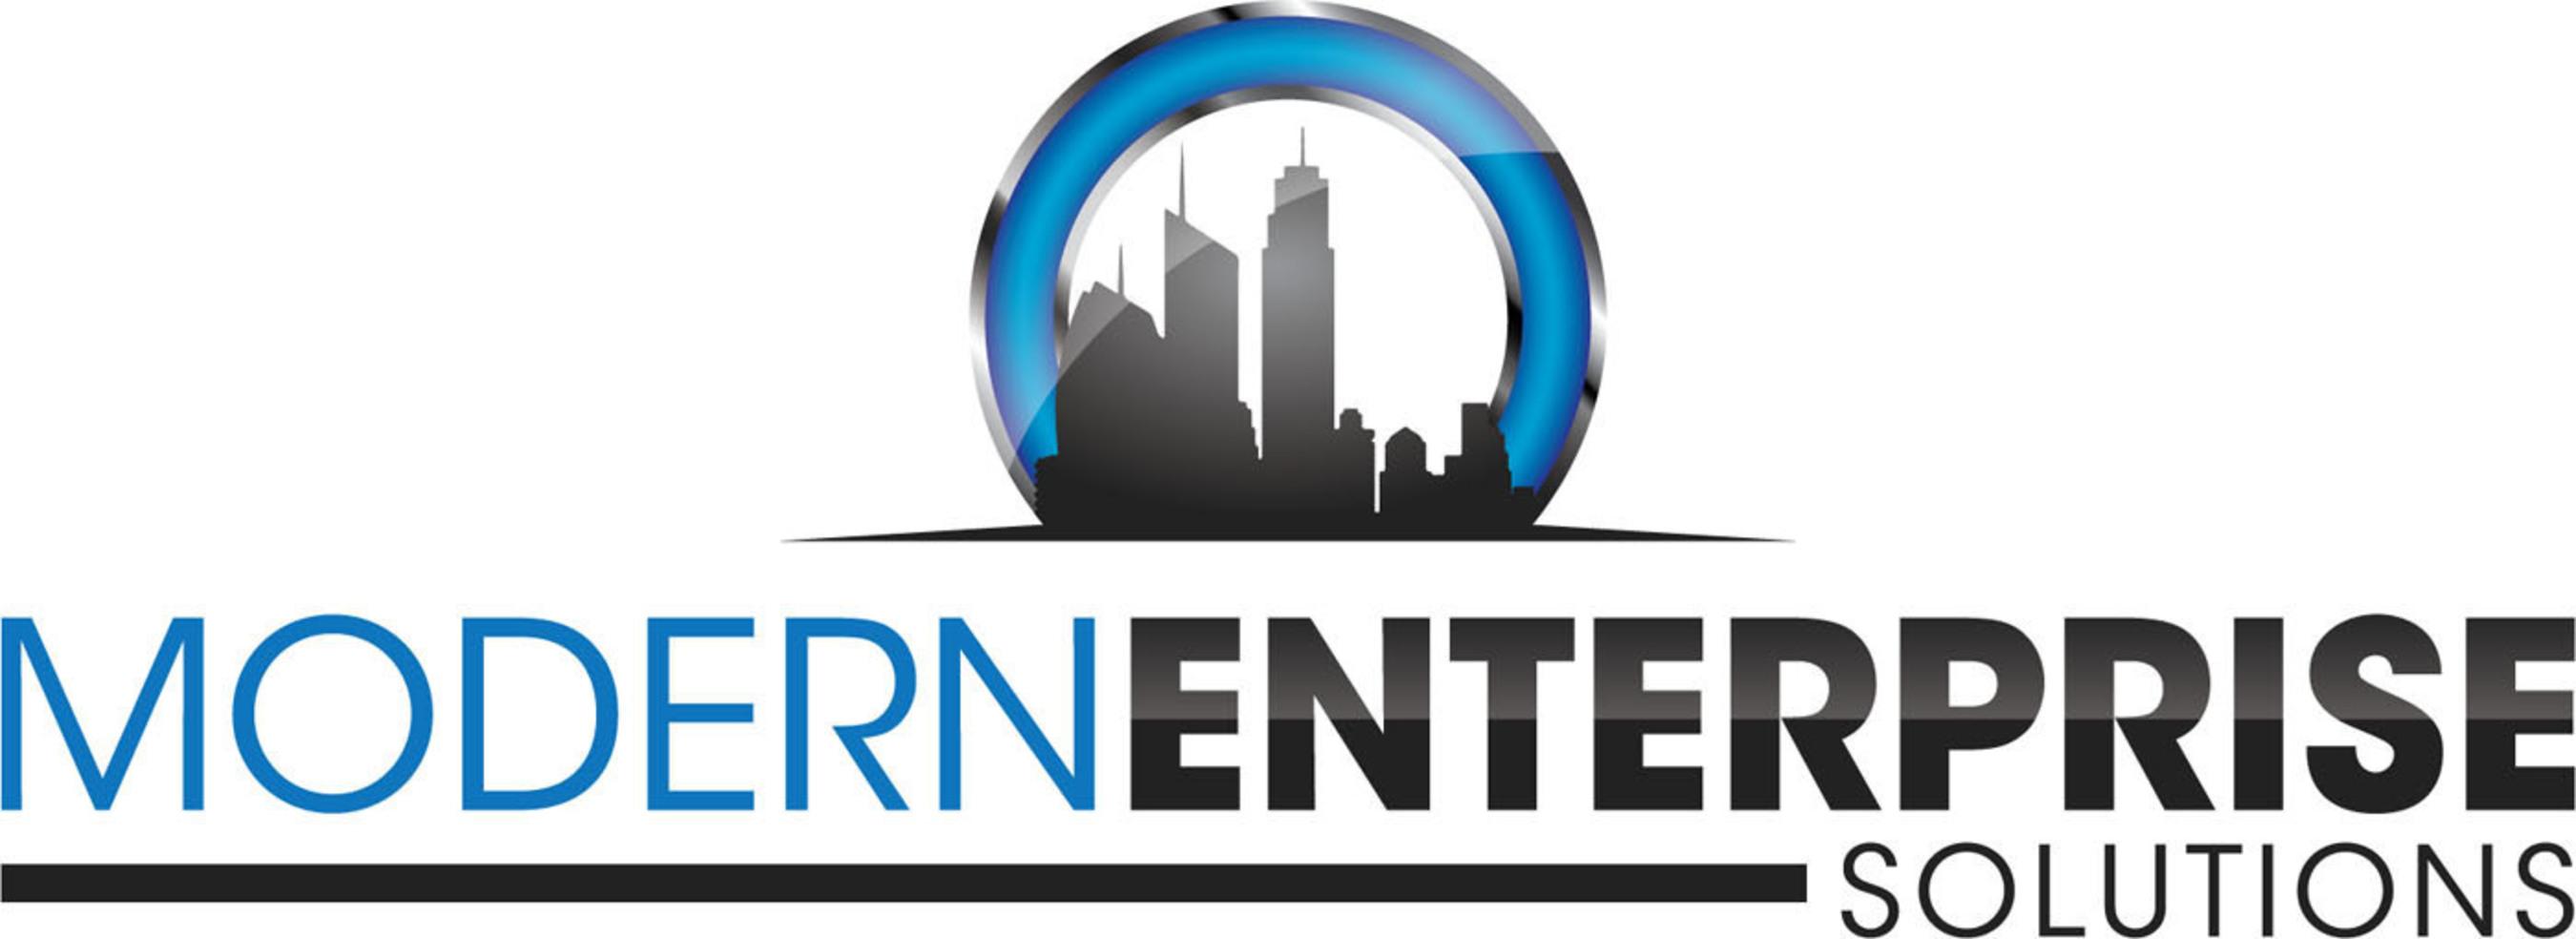 Modern Enterprise Solutions. (PRNewsFoto/Modern Enterprise Solutions) (PRNewsFoto/MODERN ENTERPRISE SOLUTIONS)